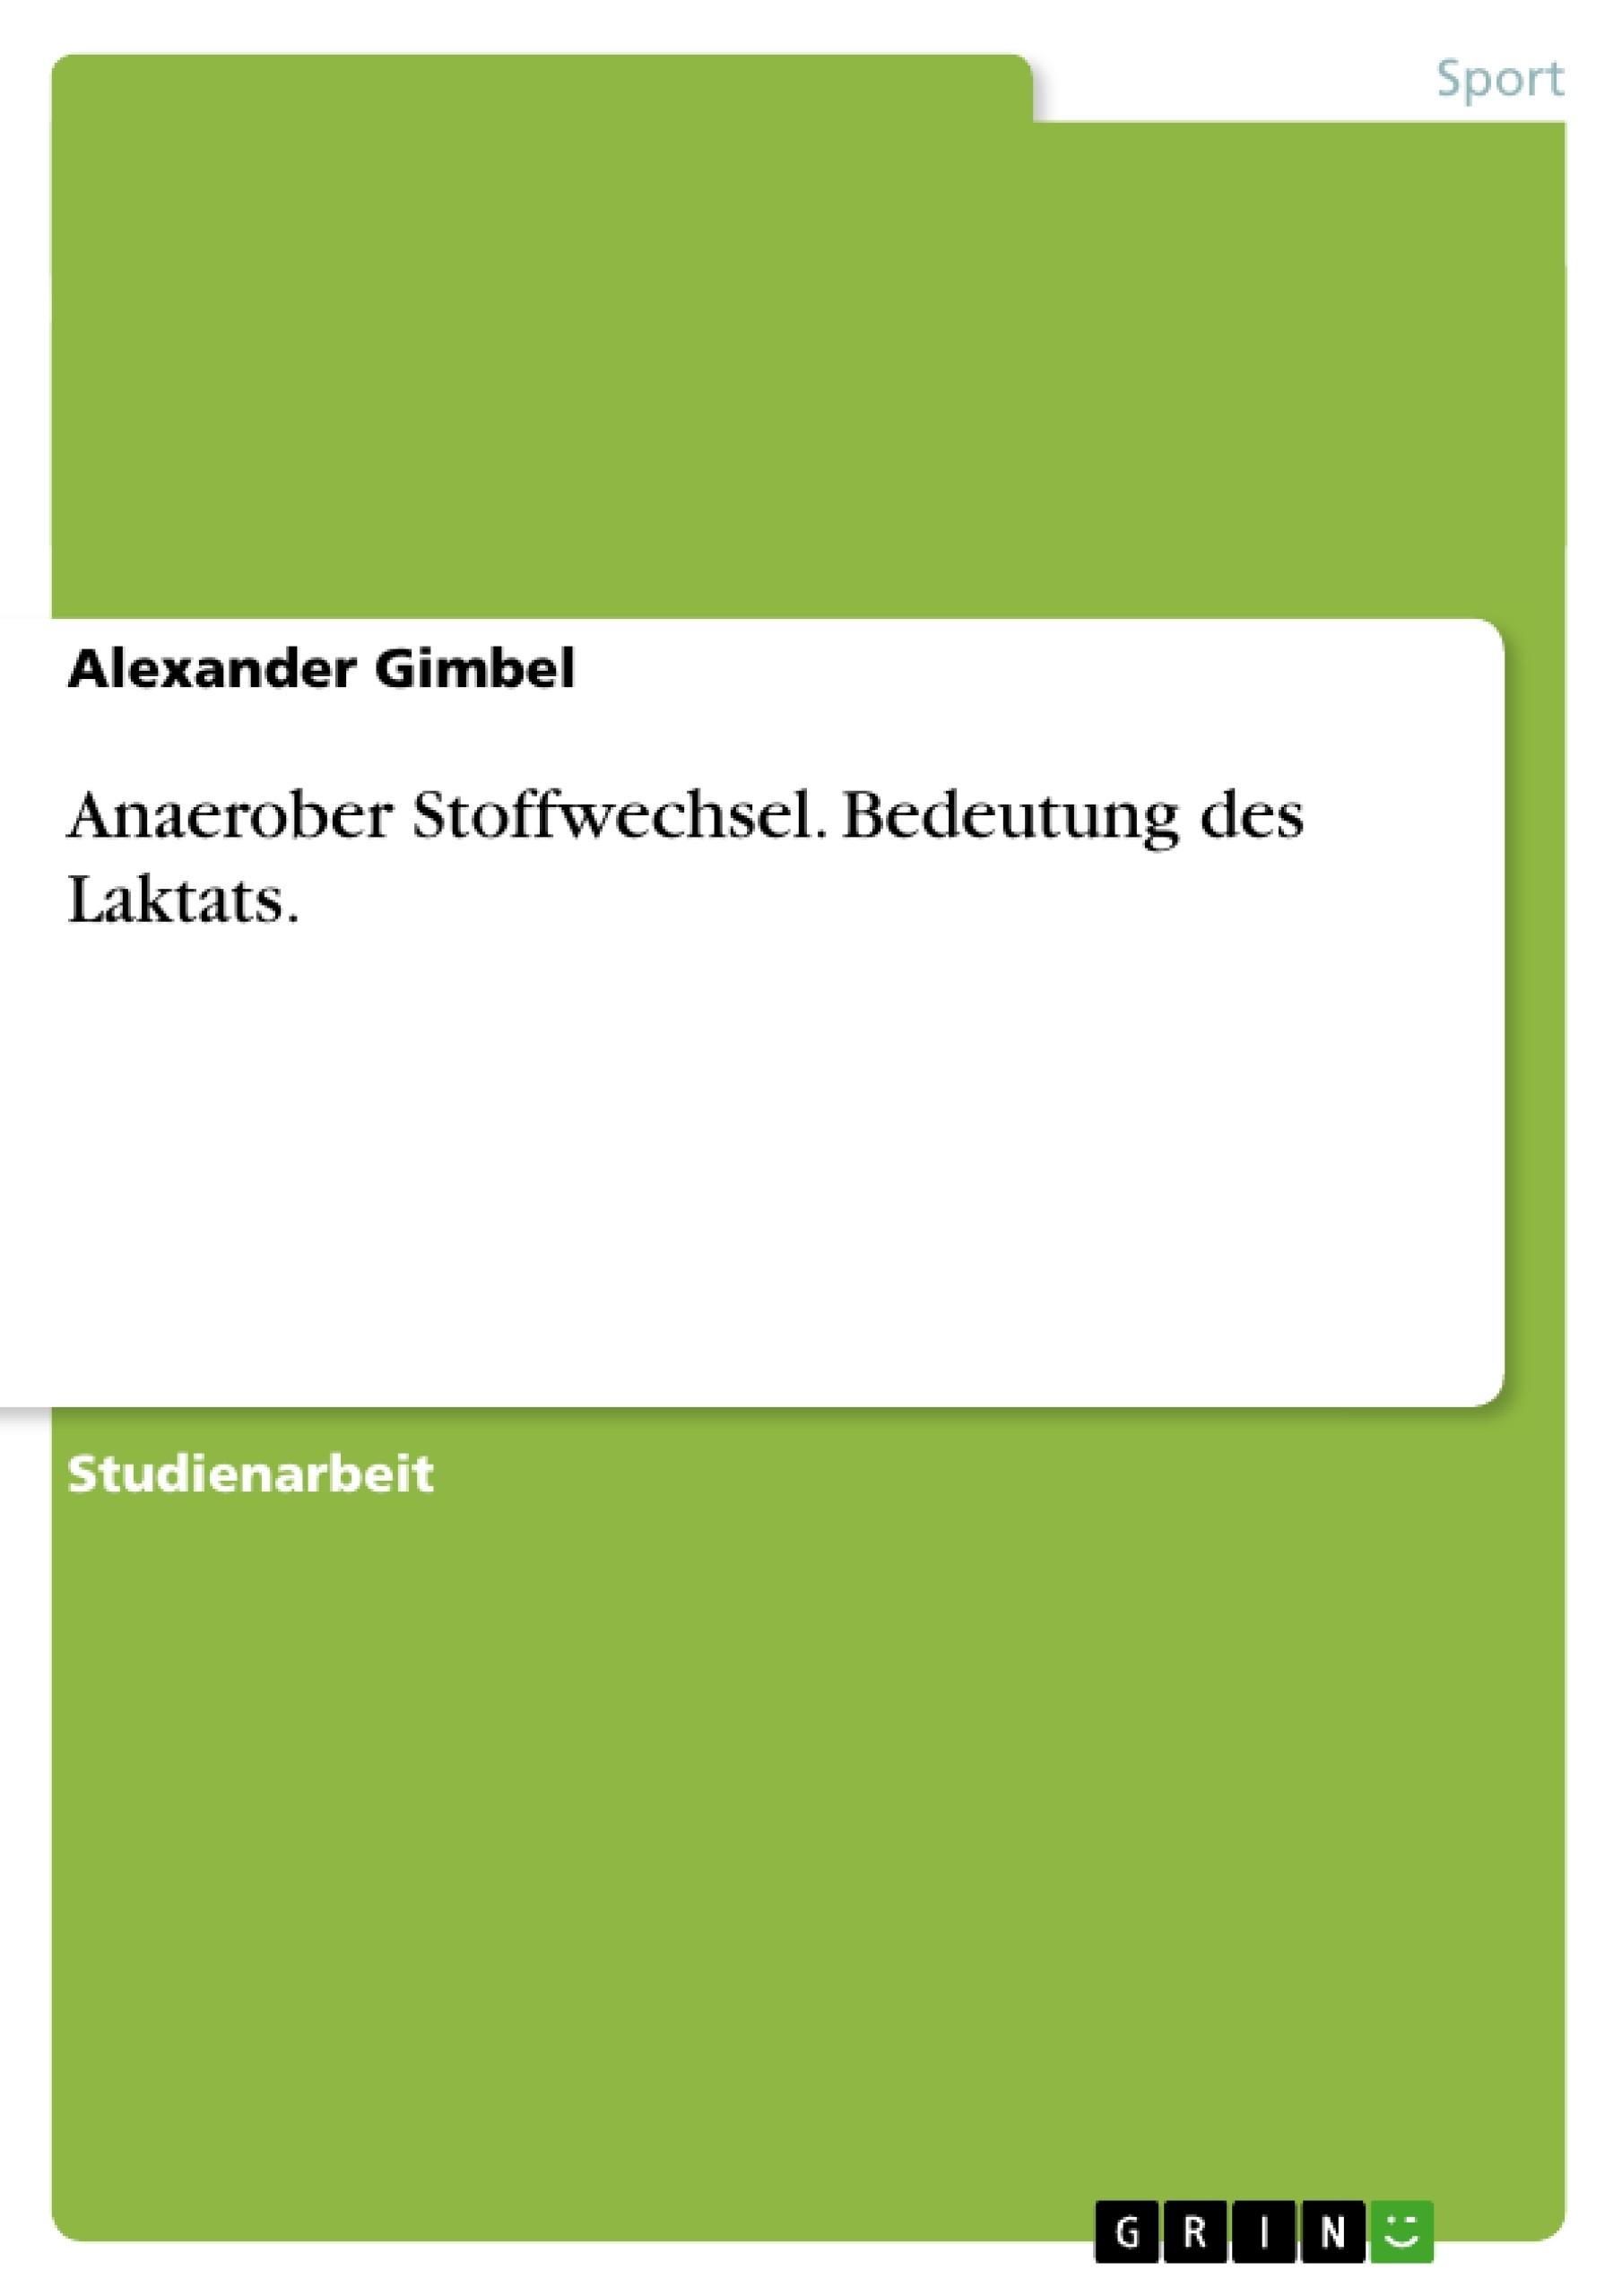 Titel: Anaerober Stoffwechsel. Bedeutung des Laktats.